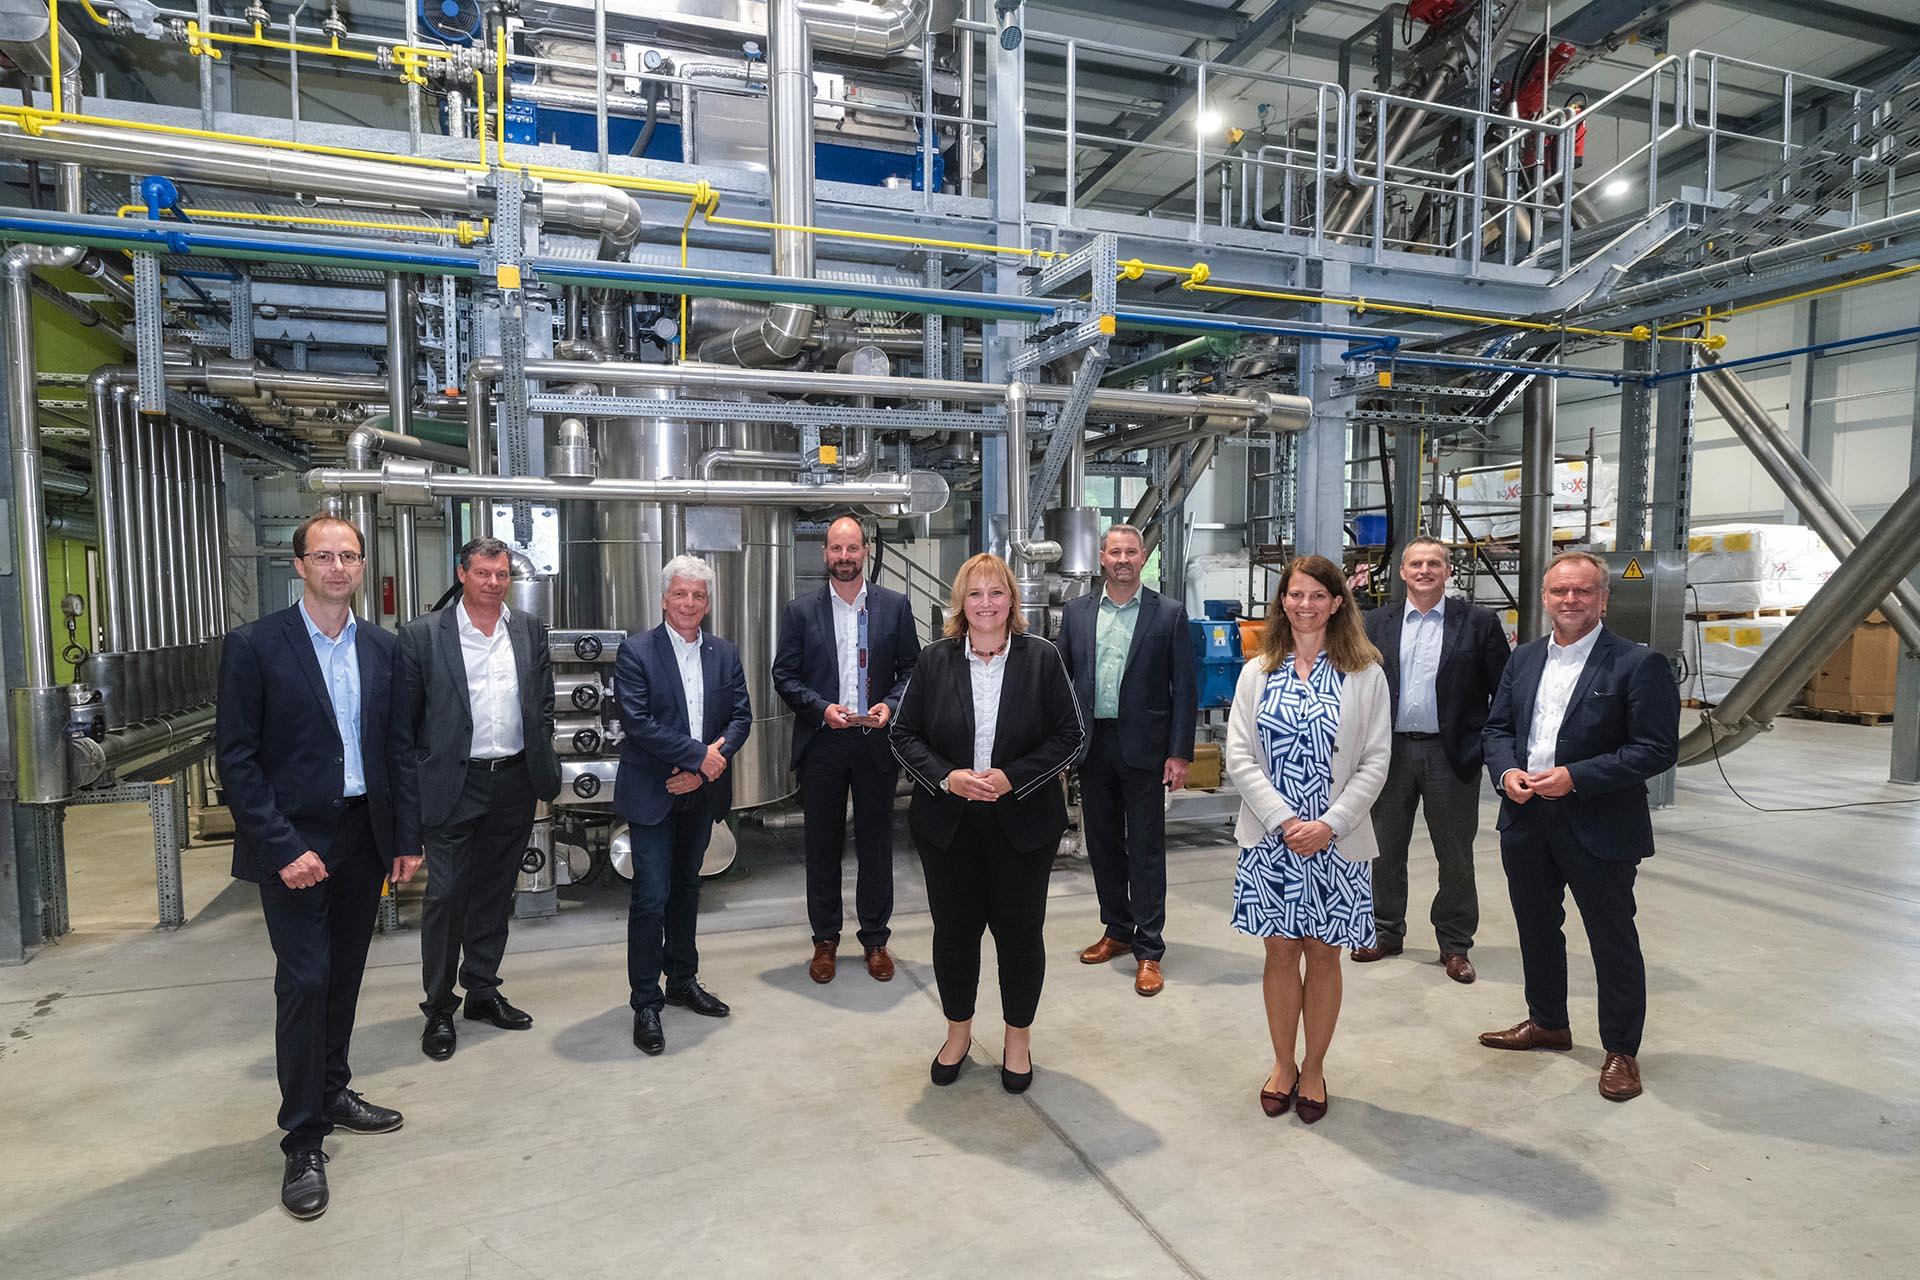 CAPHENIA produziert E-Fuels in Niedersachsen